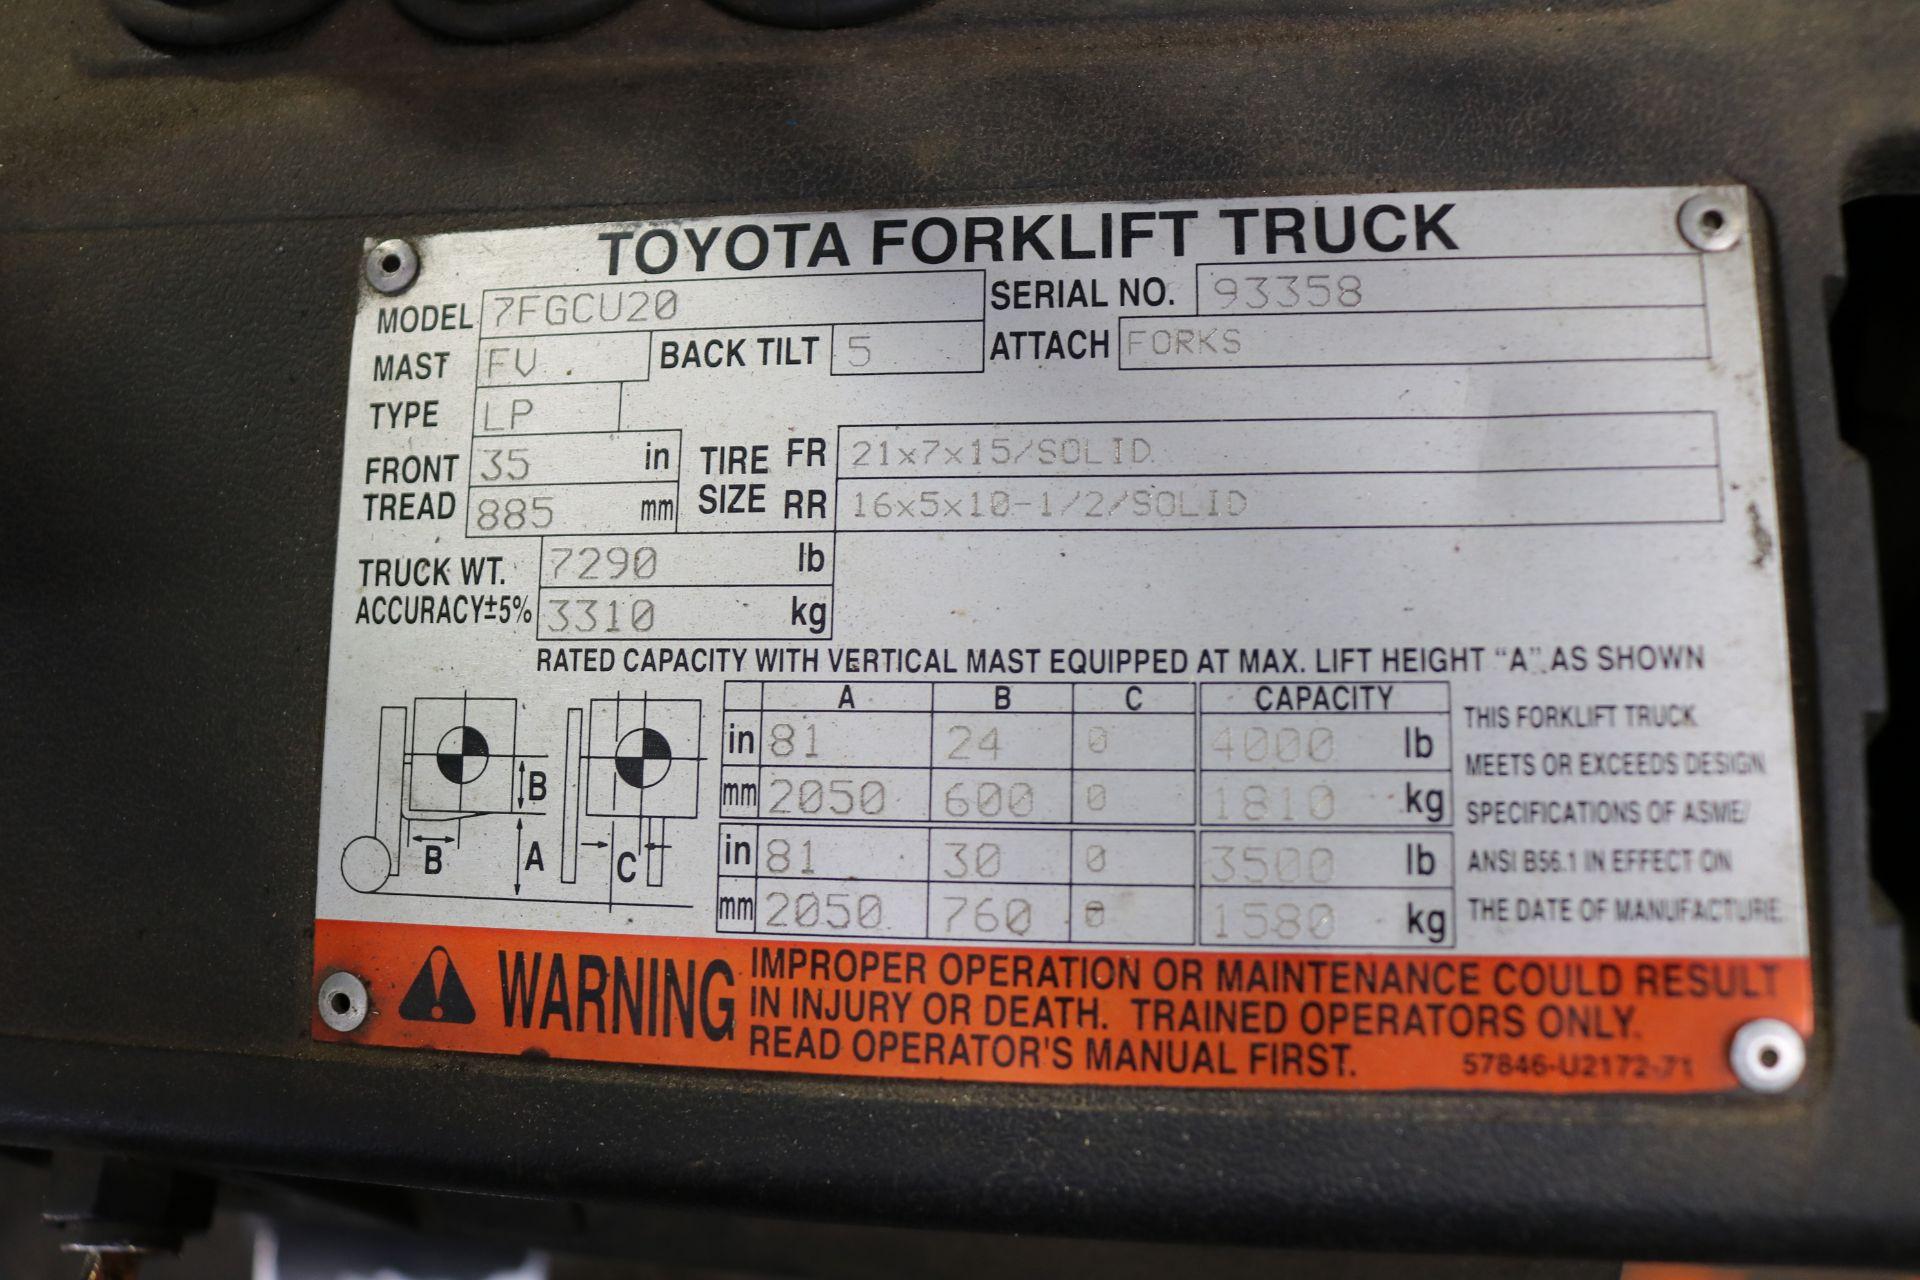 Lot 29 - TOYOTA FORKLIFT, MODEL 7FGCU20, 4,000 LB CAPACITY, LPG, S/N 93358